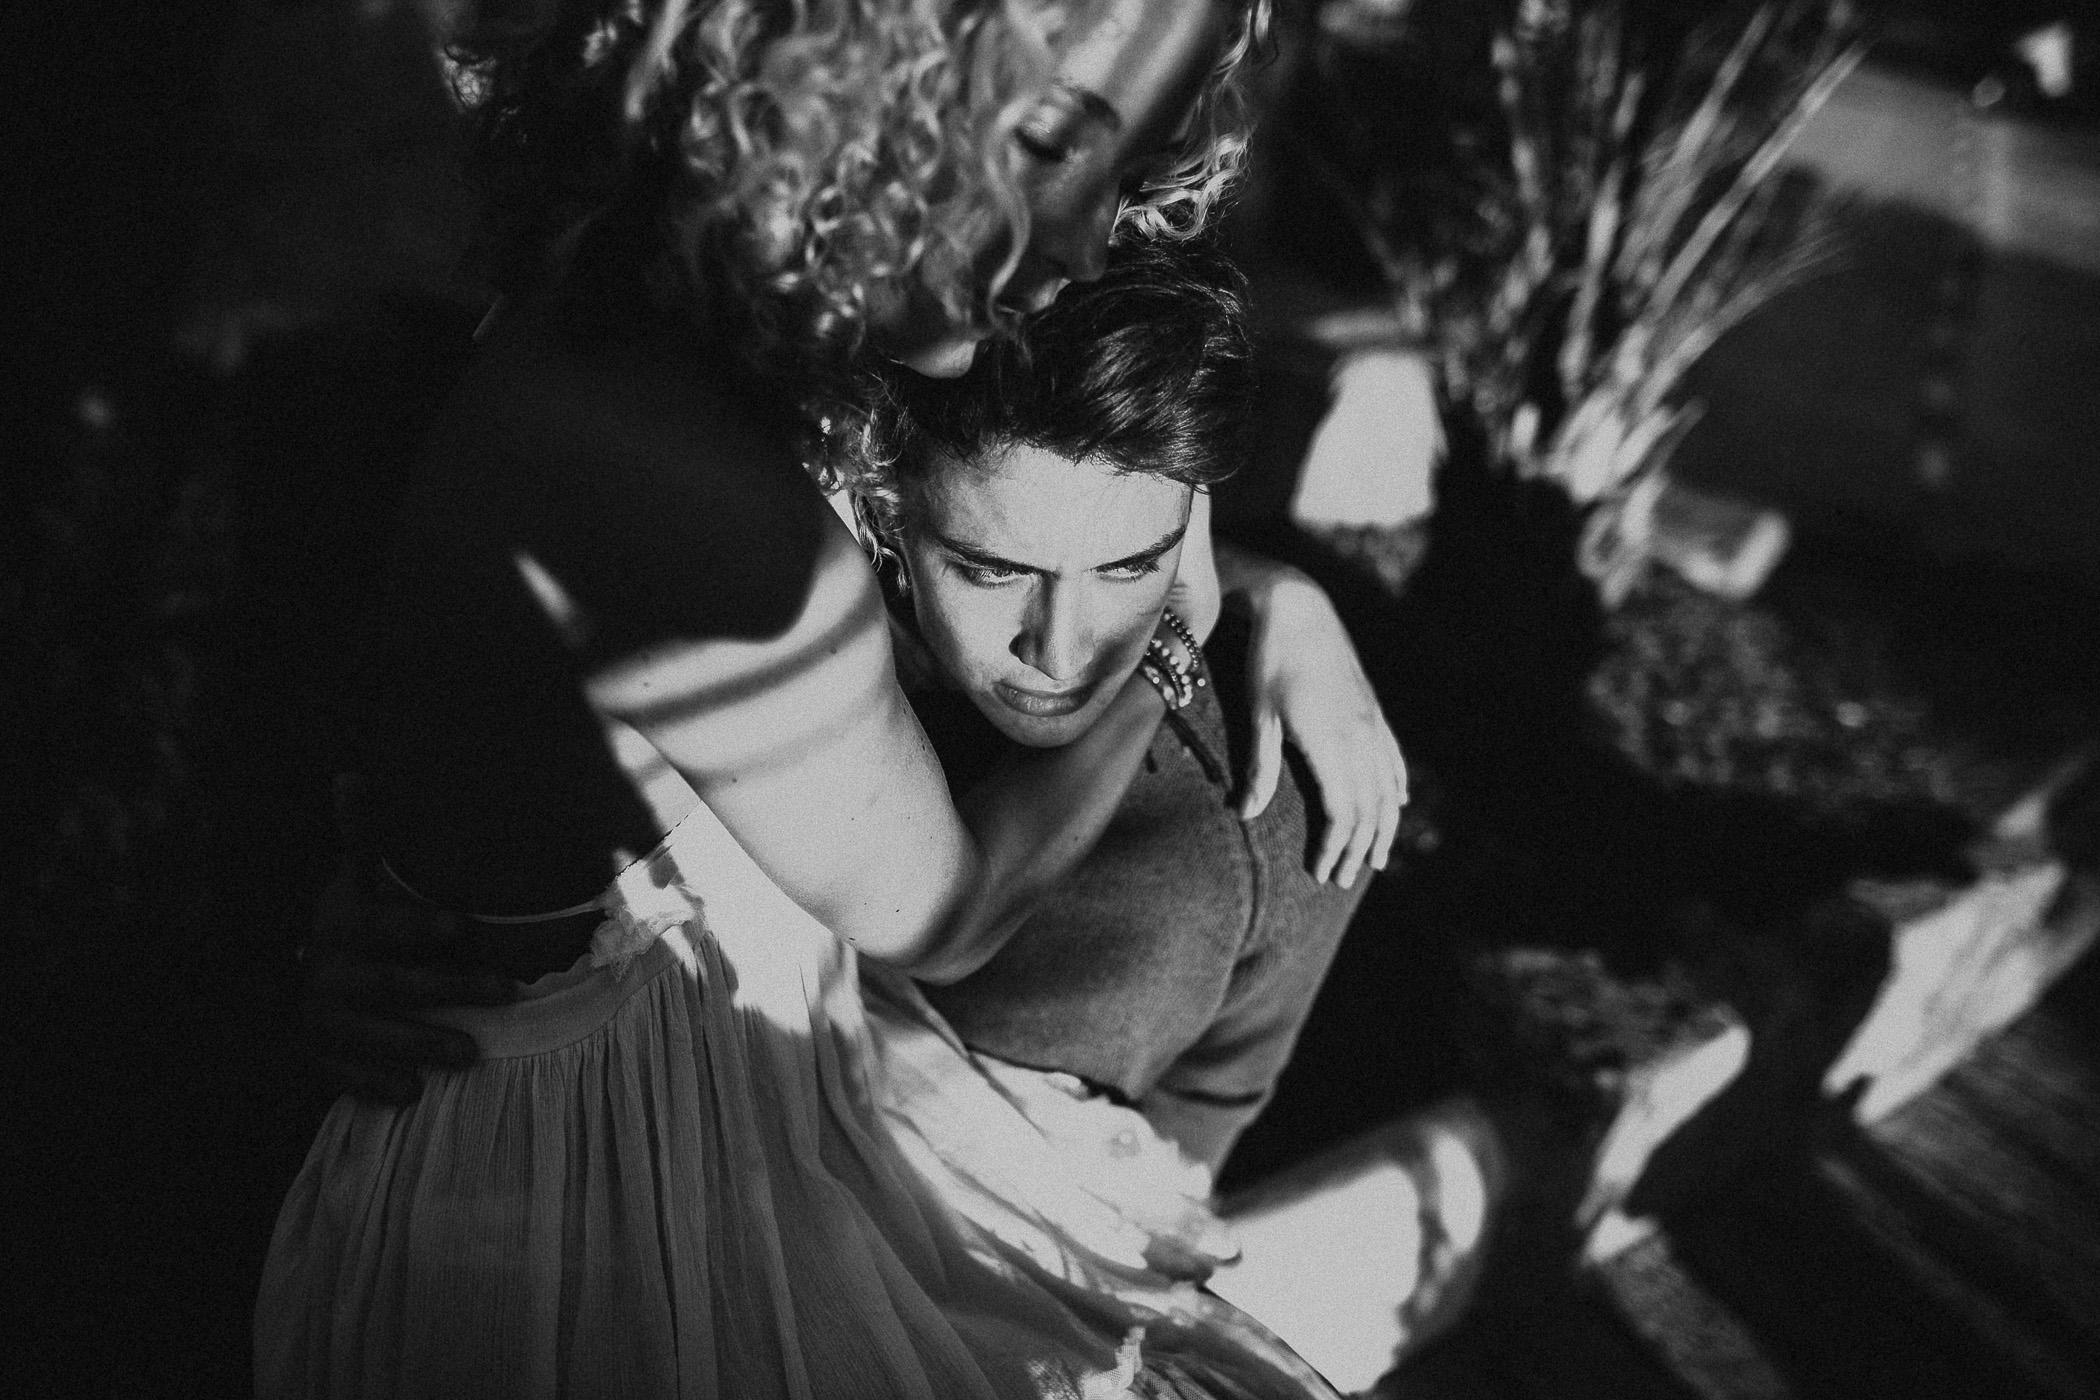 DanielaMarquardtPhotography_elopement_mallorca_spain_paguera_palma_charlyandbela_68